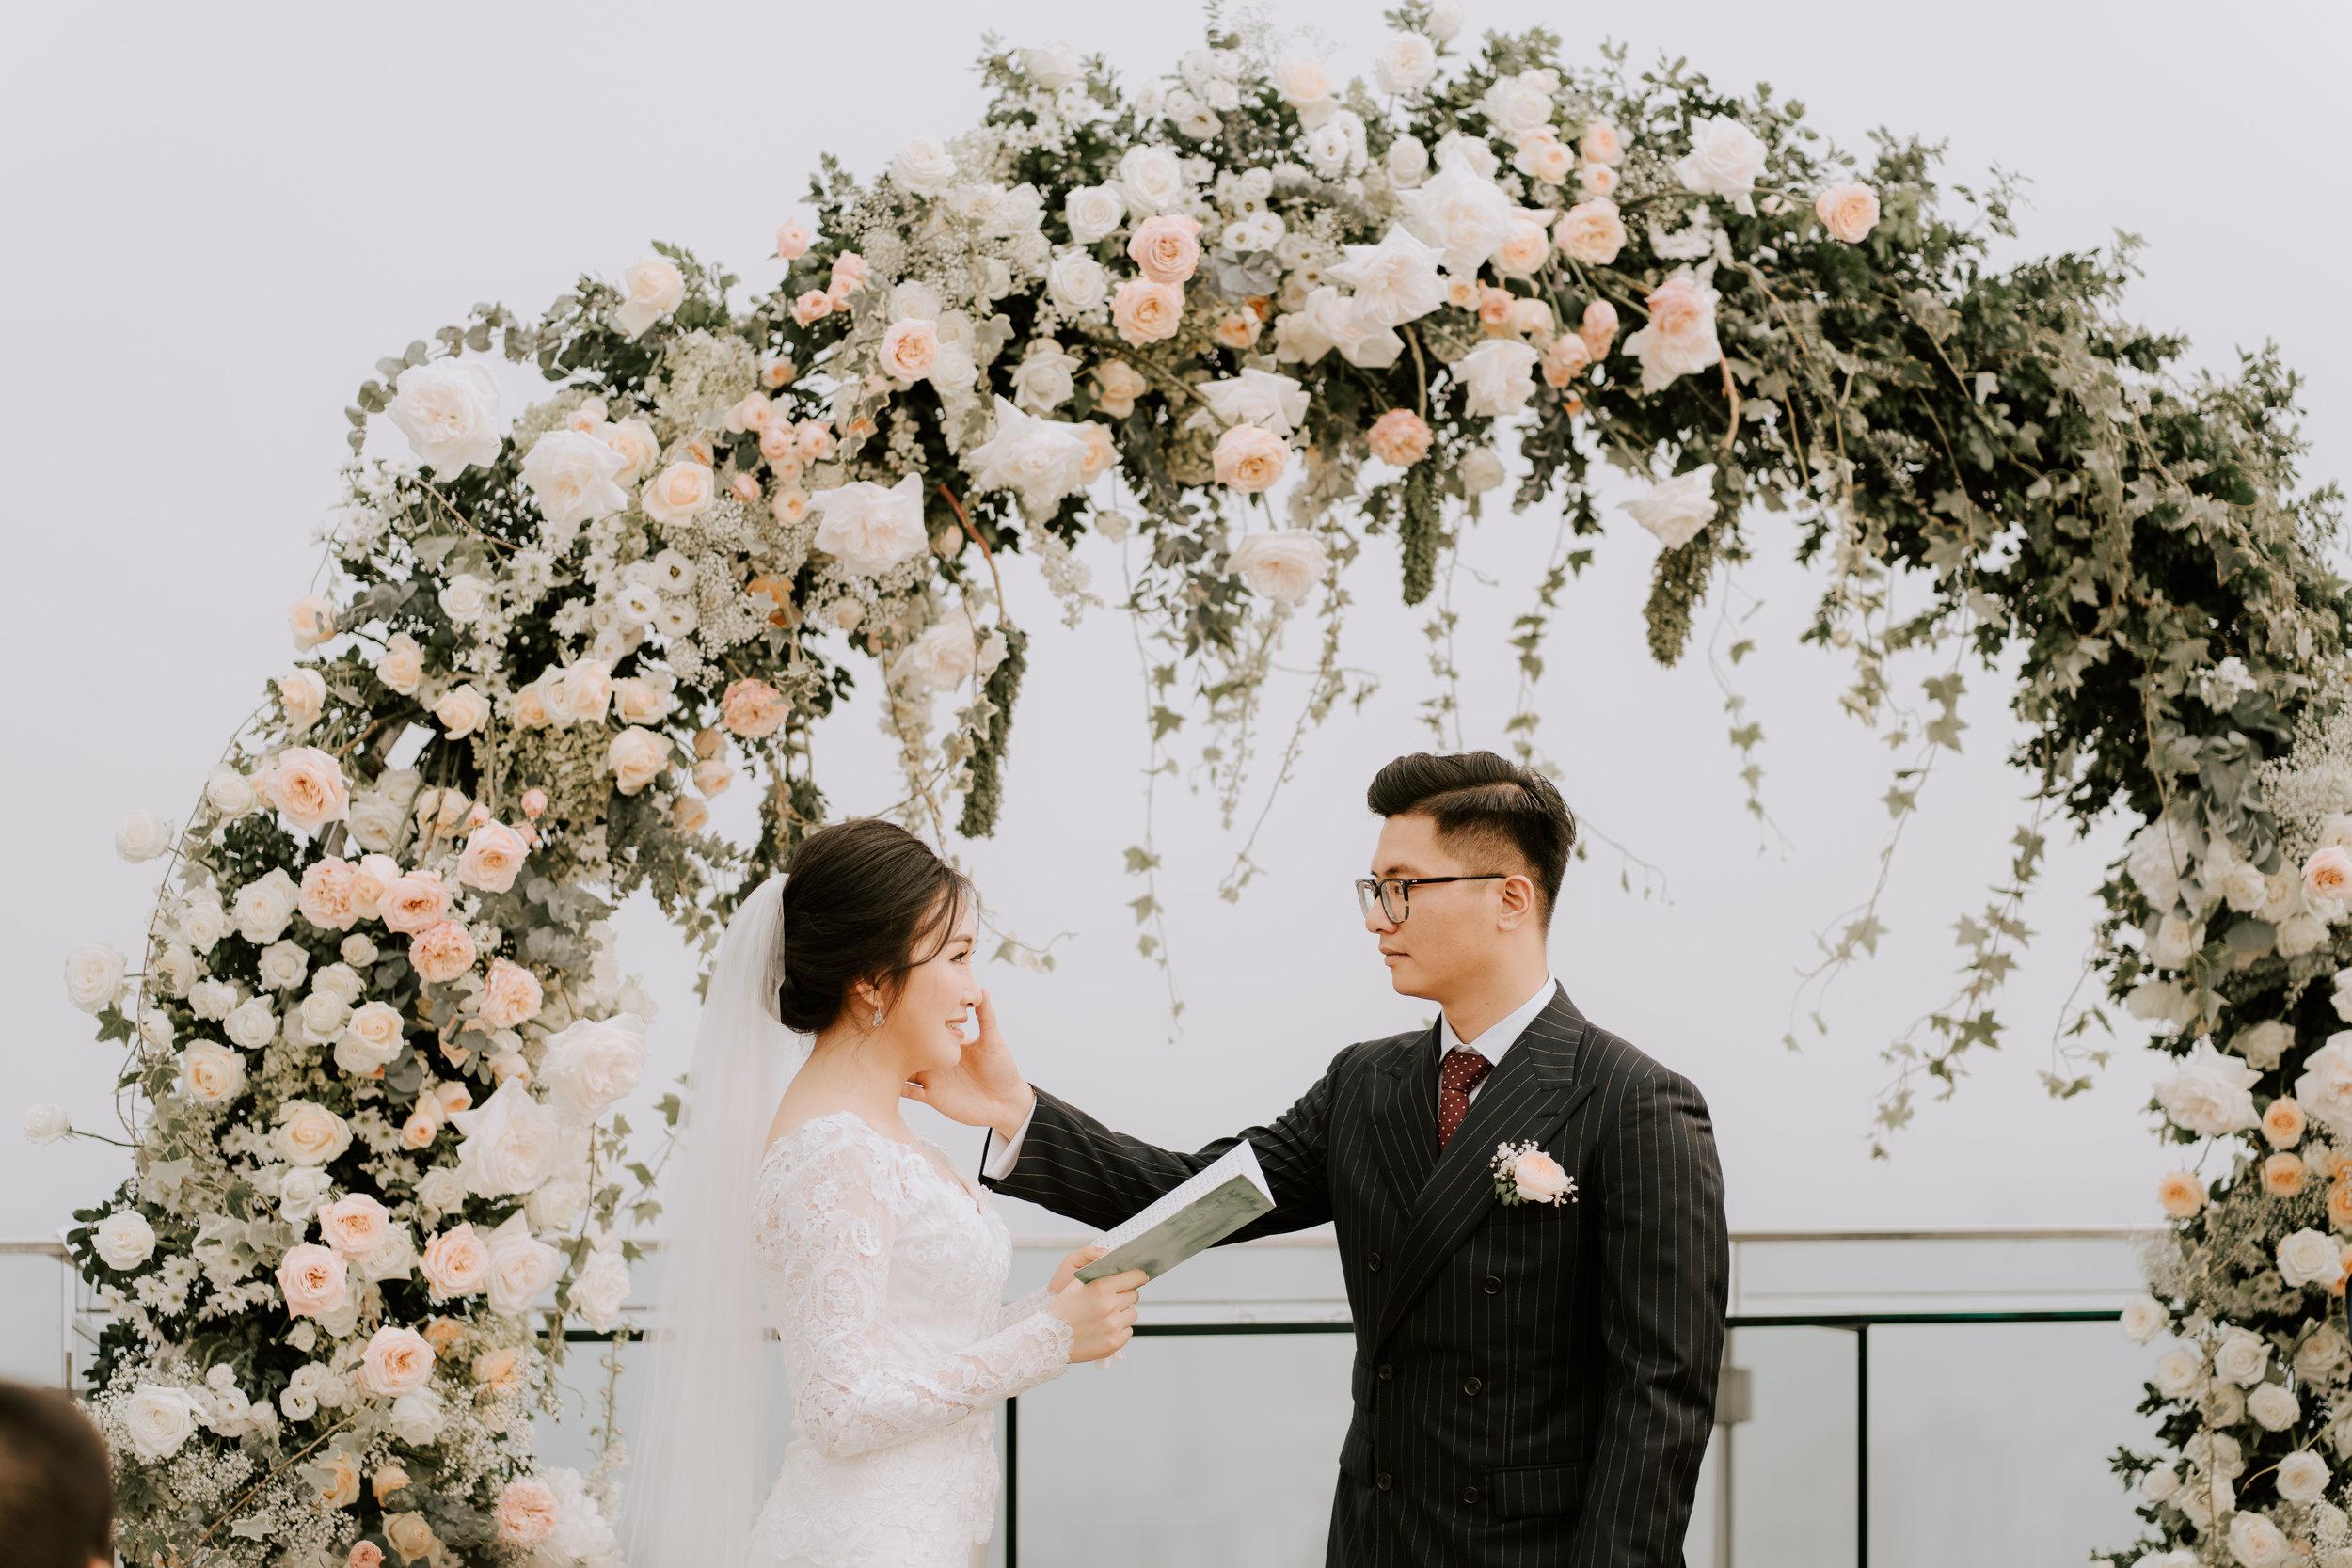 Mirrorwedding Destination Photographer TopofHanoi Duc Anh Hien Trang 165110.jpg